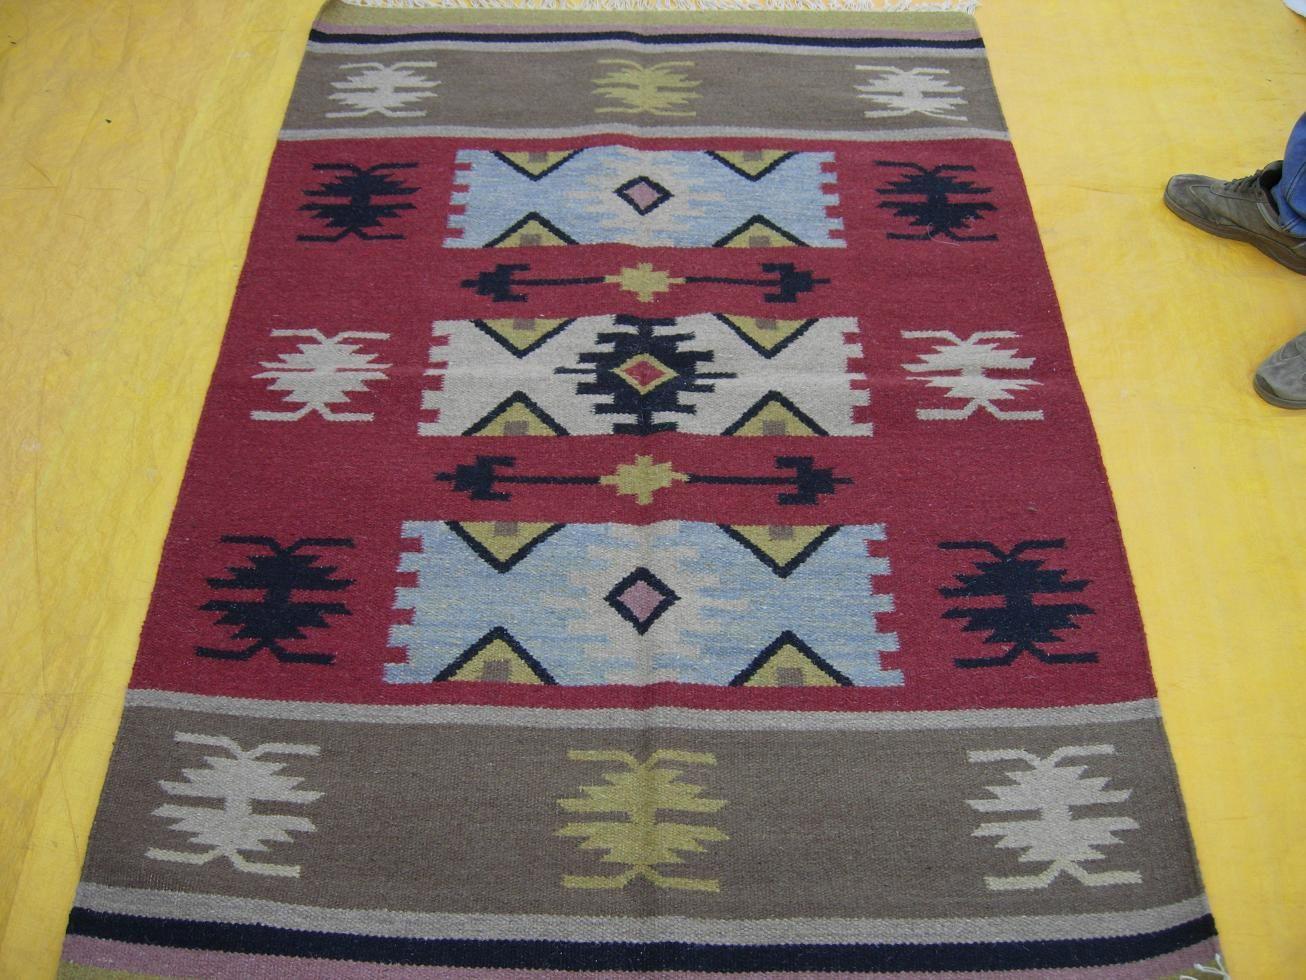 Www Surekasgroup Com Punja Dhurrie Or Say Reversable Woolen Rugs Manufactured In India By Global Flatwoven Kelims Dhurries Manufacturers In India Custo